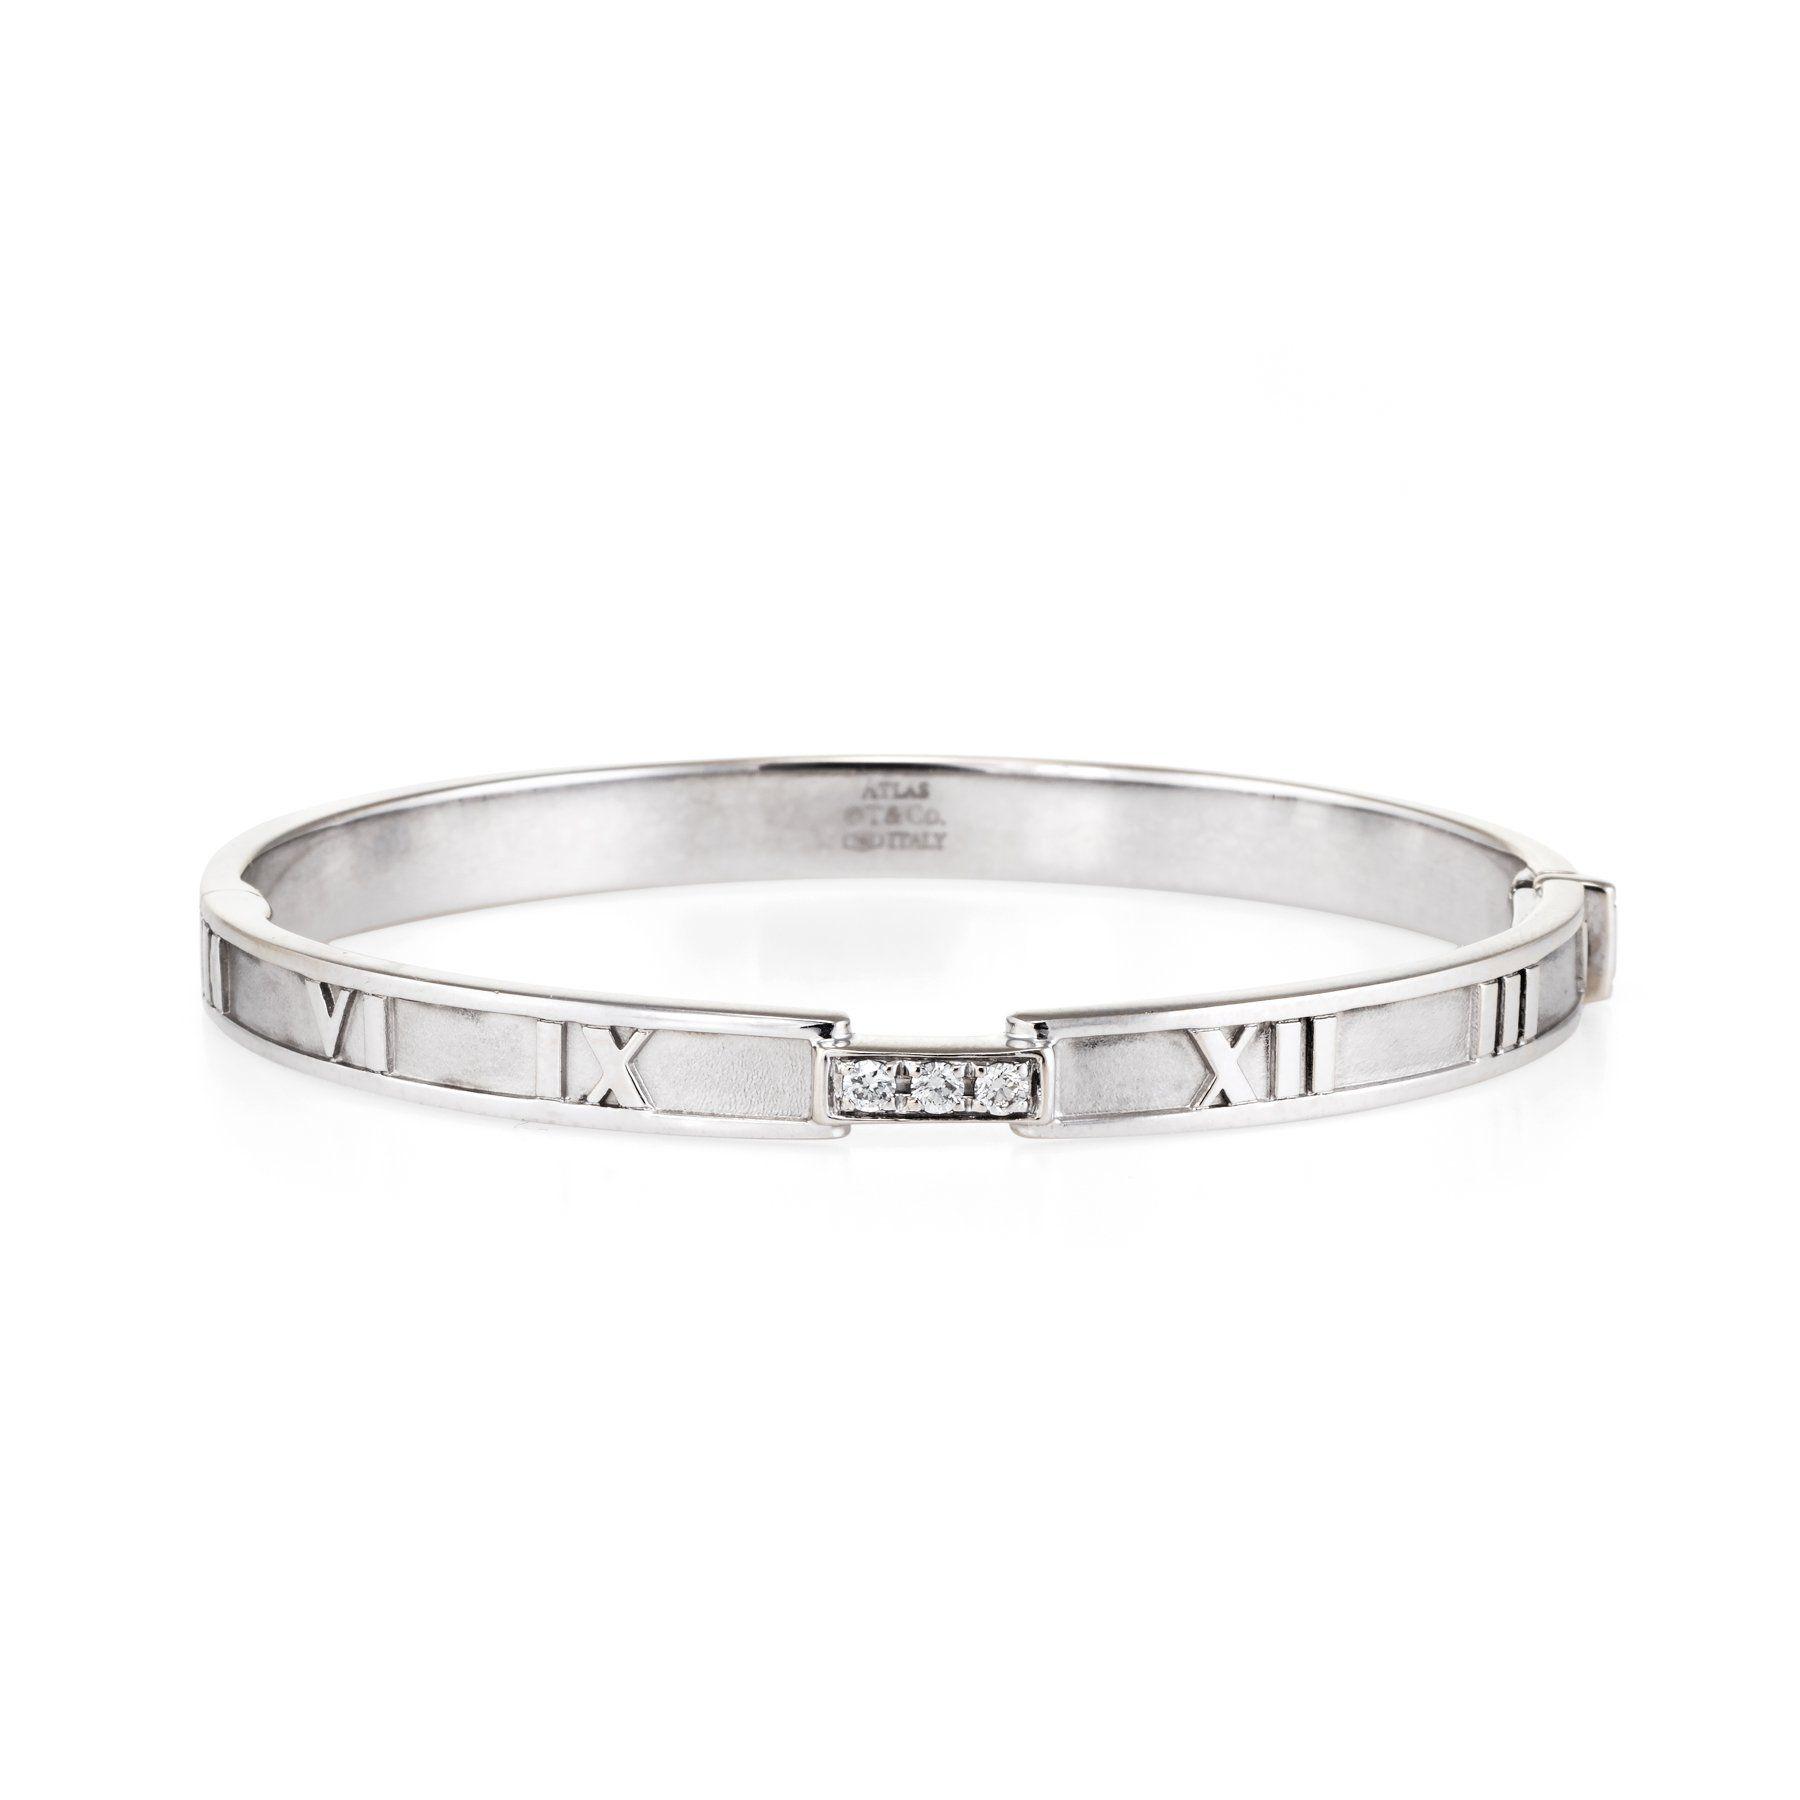 ed10a6ec3 Tiffany & Co Atlas Diamond Closed Hinged Bangle Bracelet | Products ...